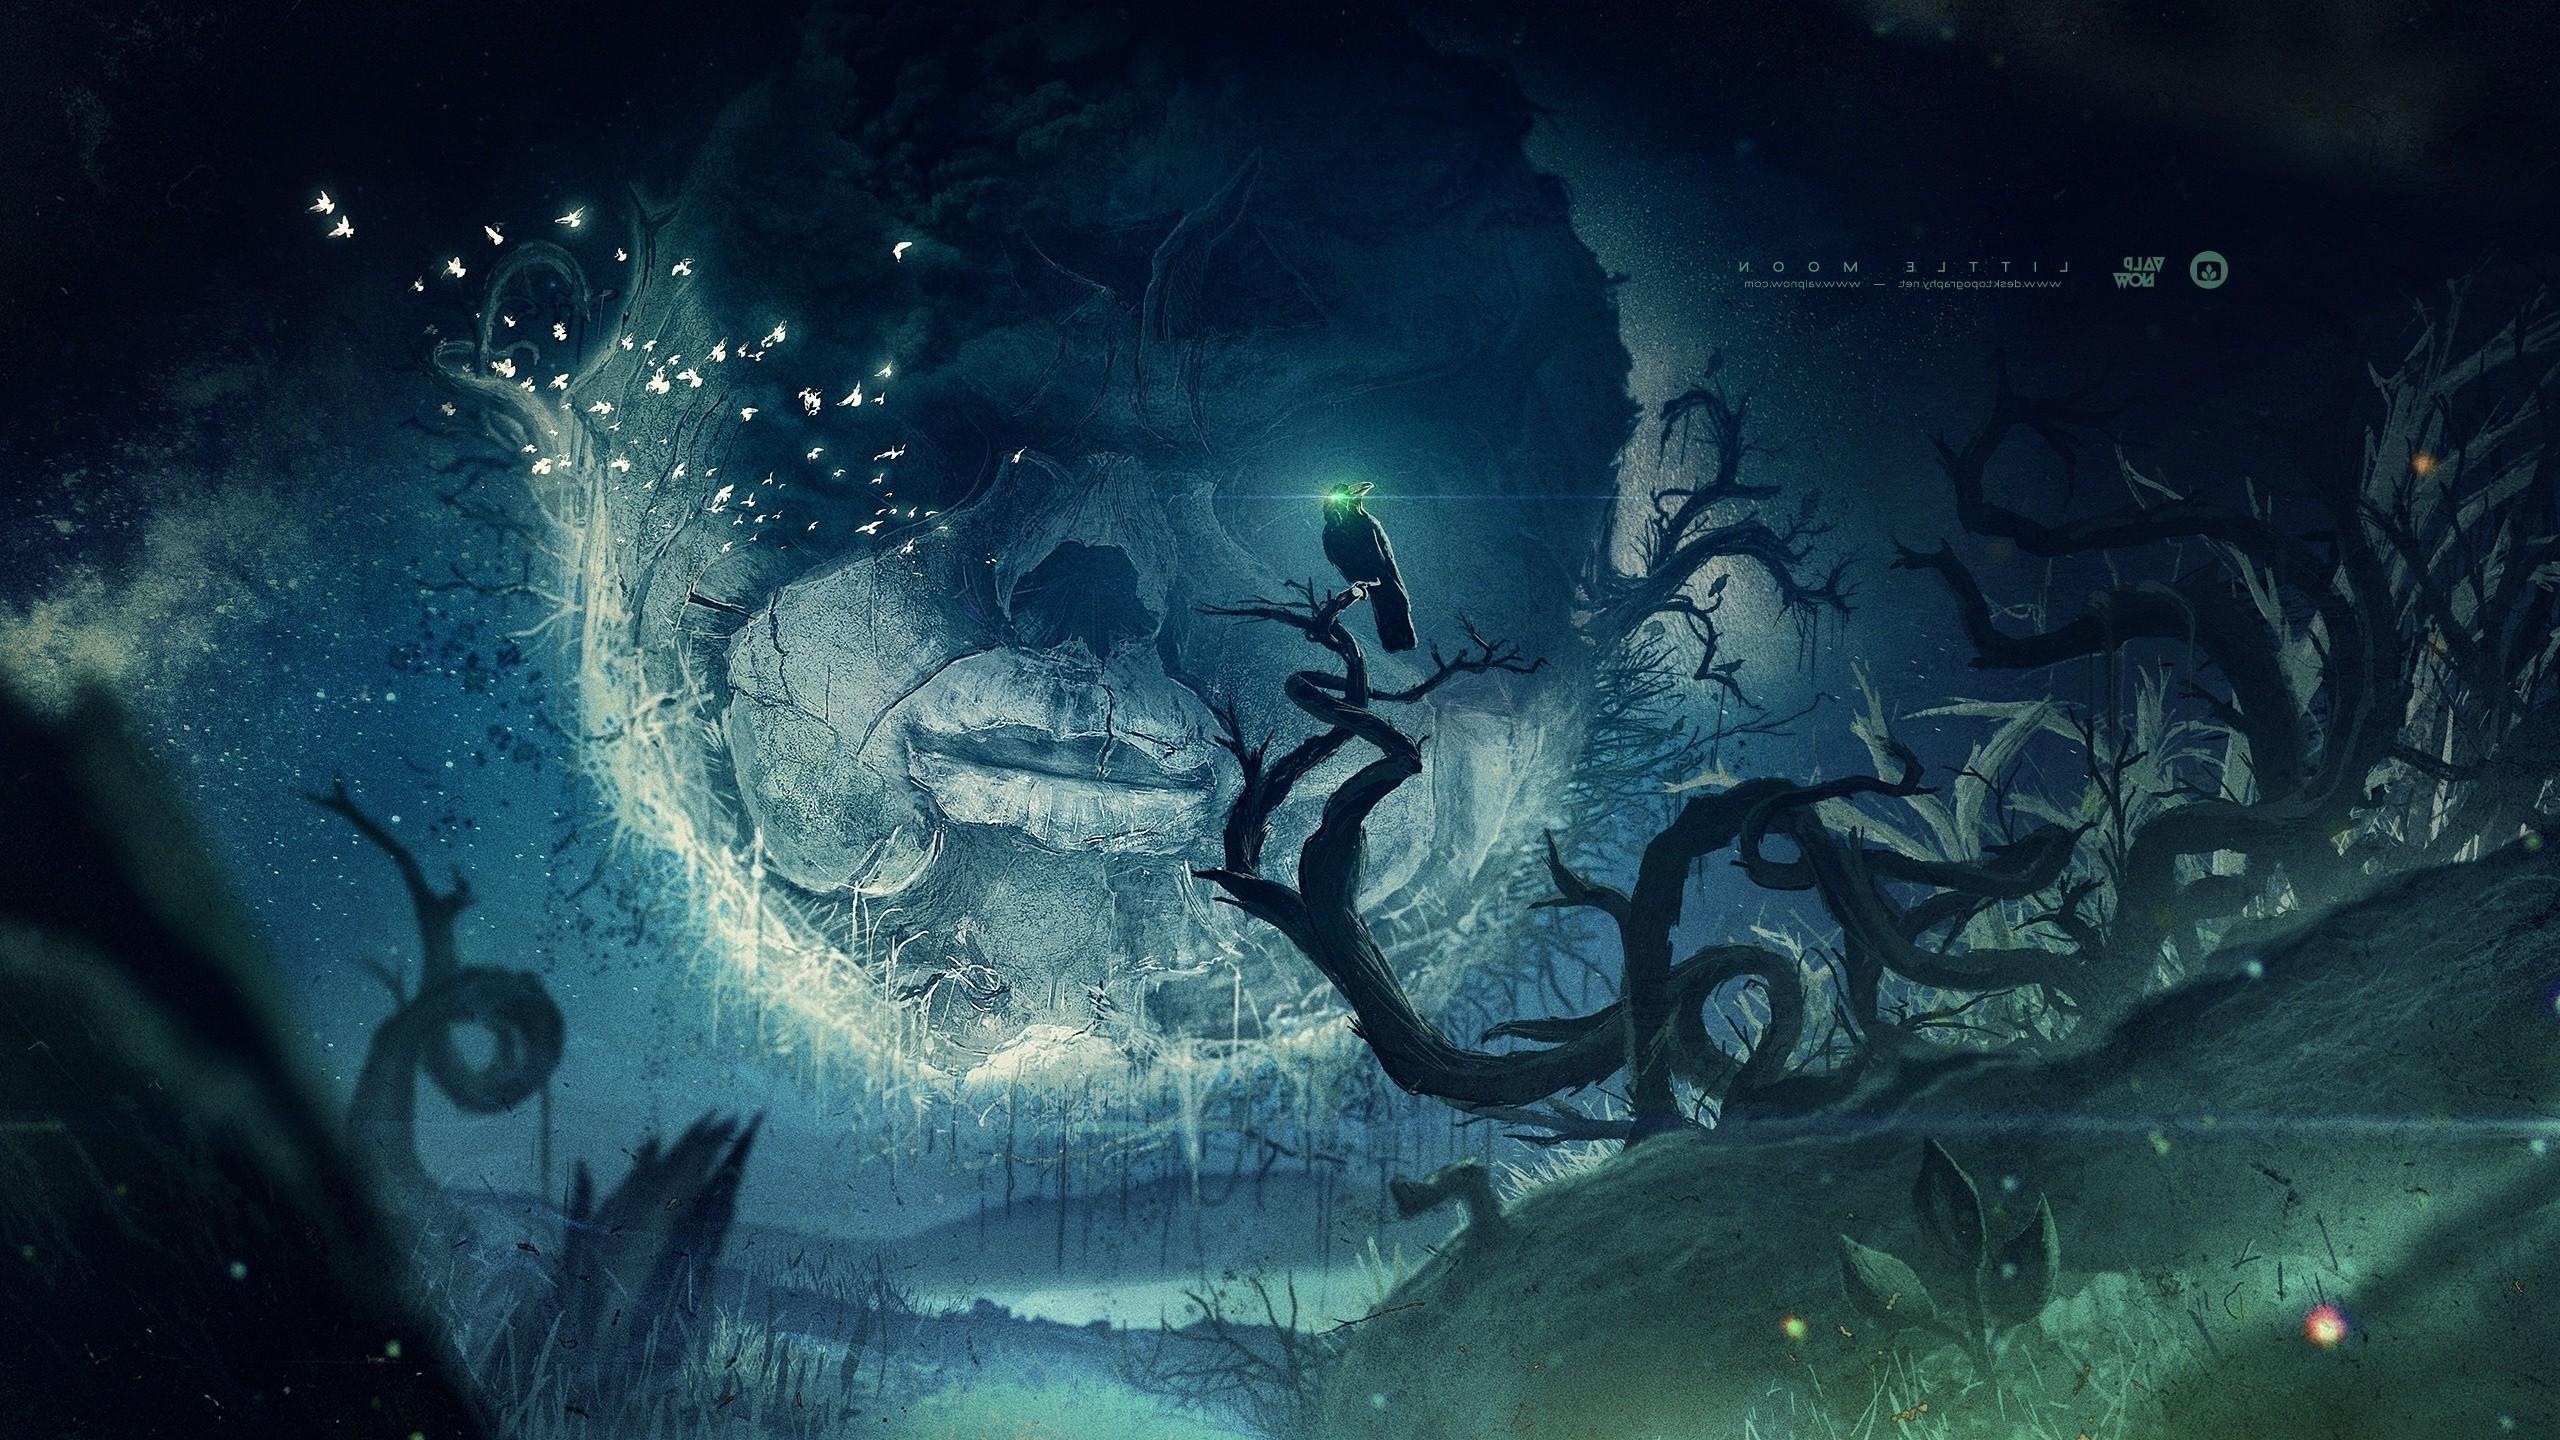 Desktopography, Raven, Face, Pigeons, Fantasy Art, Mist, Moon, Valpnow  Wallpapers HD / Desktop and Mobile Backgrounds